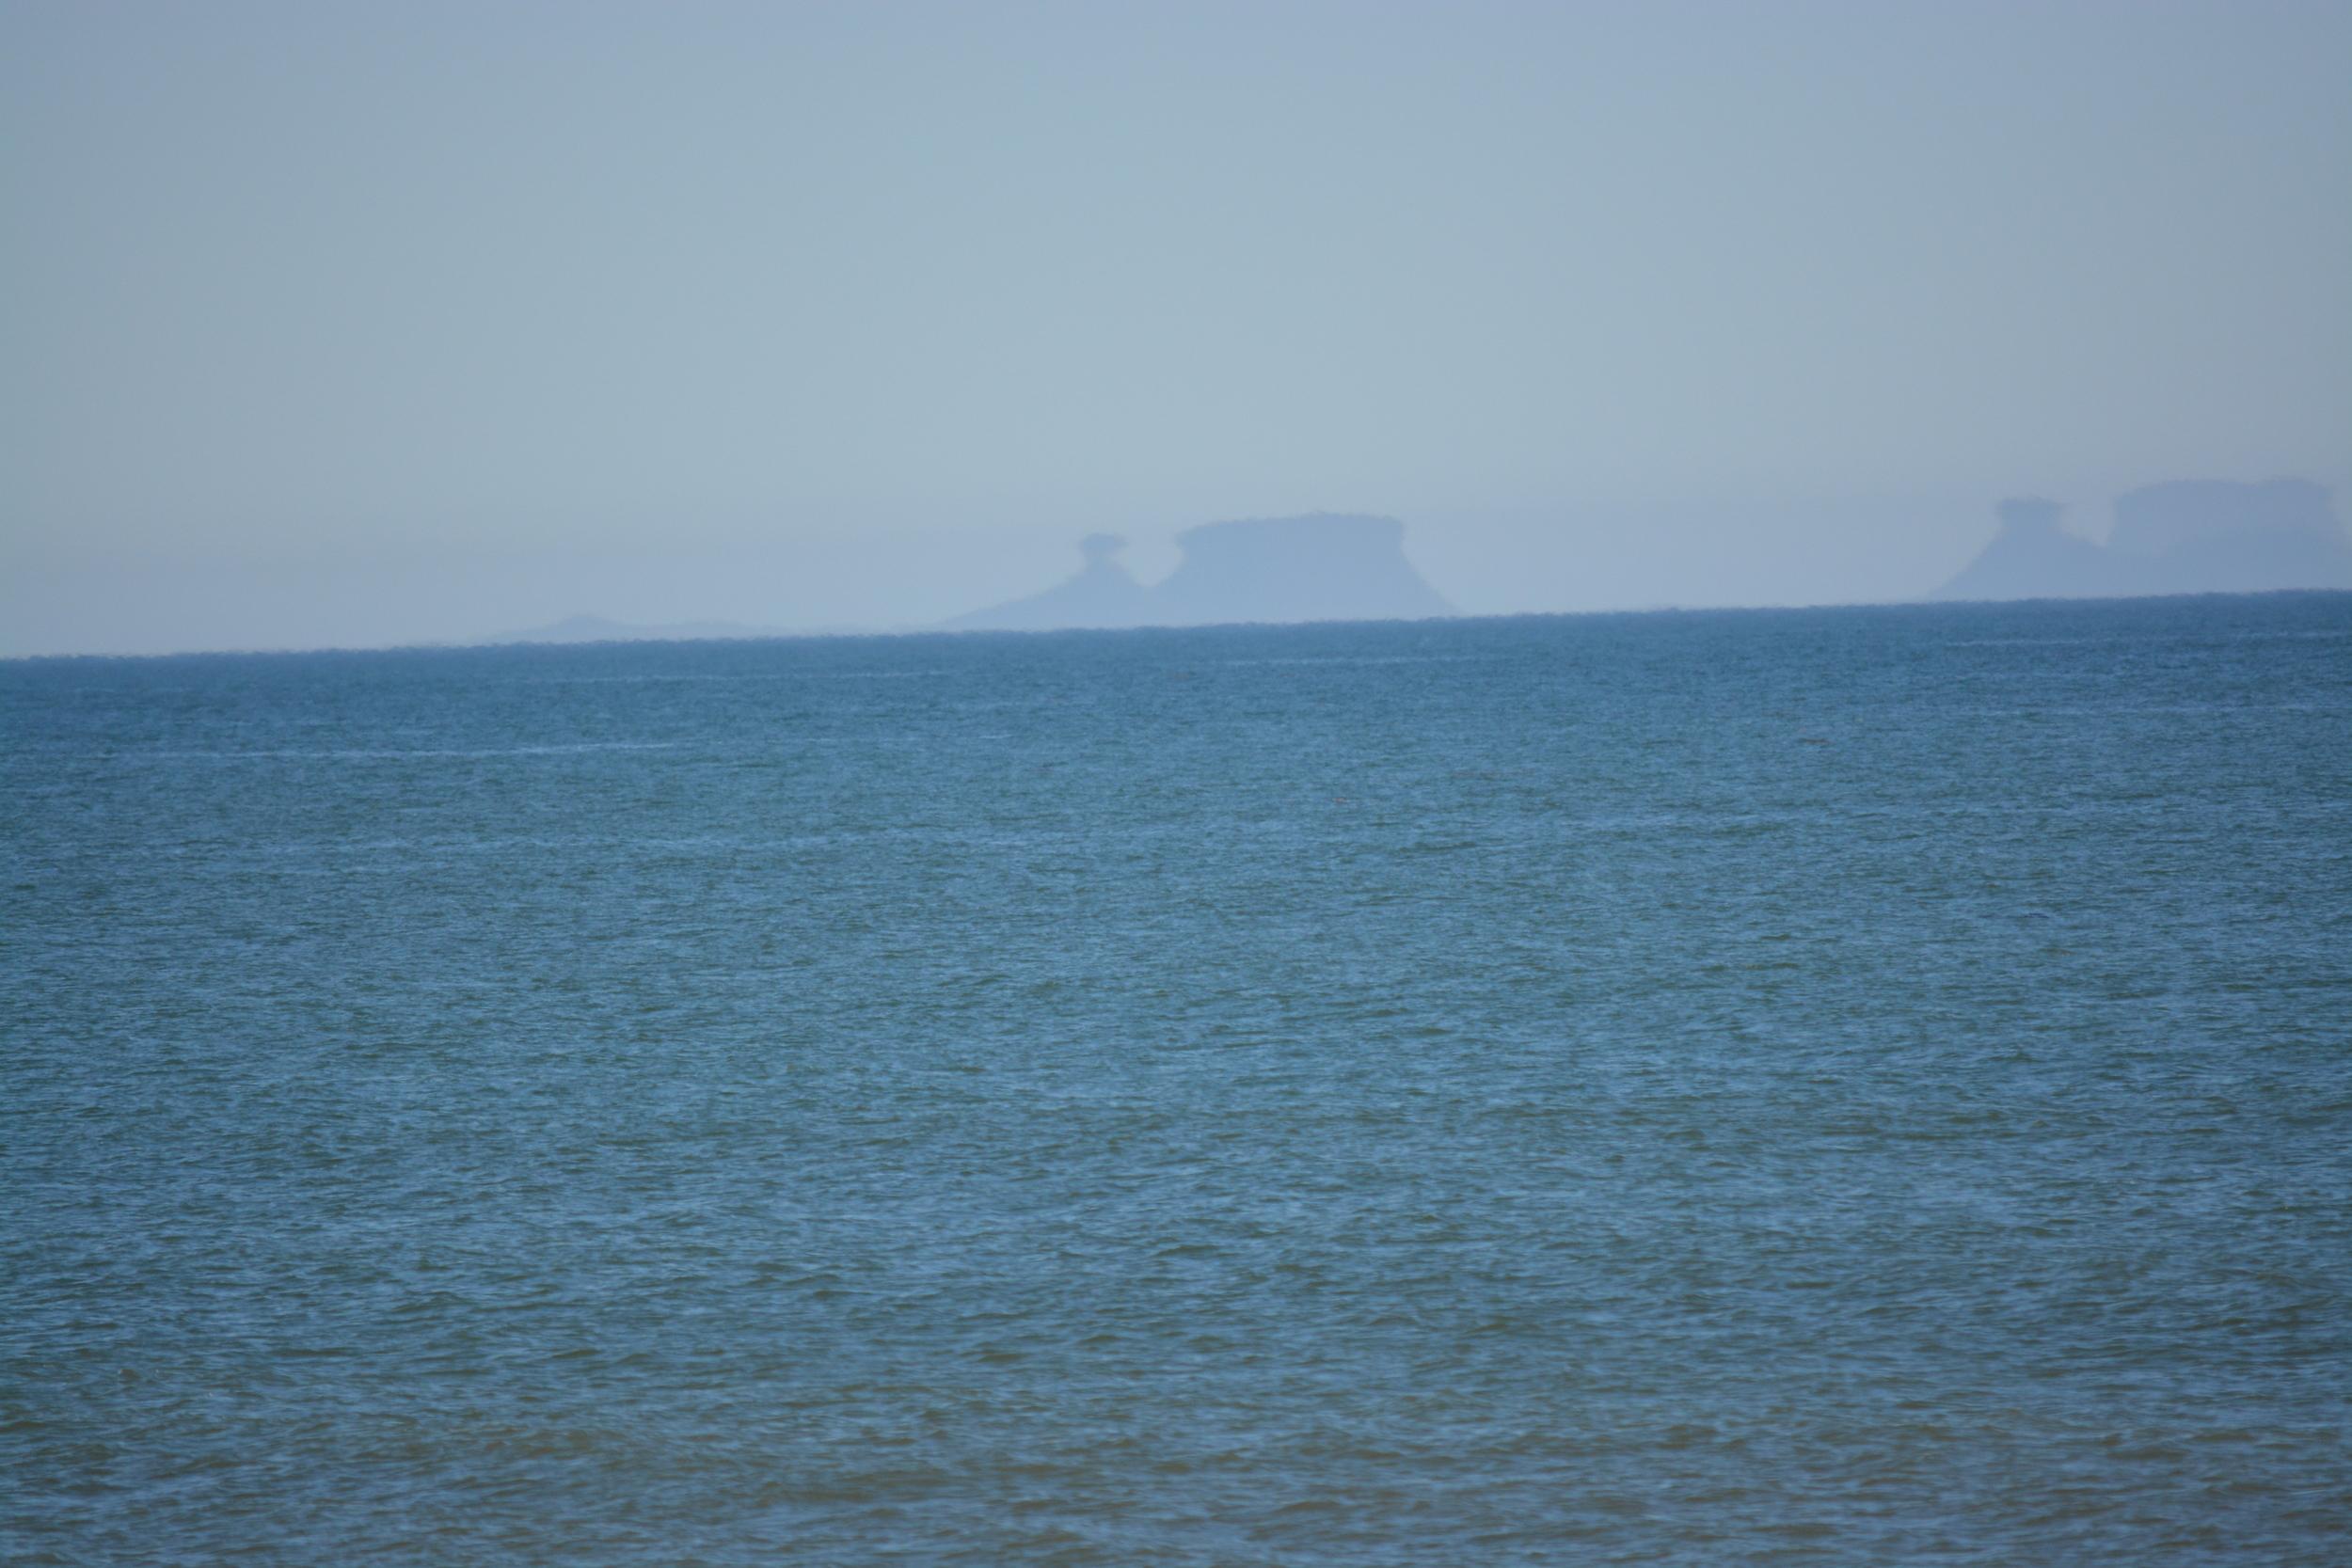 Baja California 10-5-13 Shipwrecks Surfing Adventure Ocean Experience Surf School San Diego (85).JPG